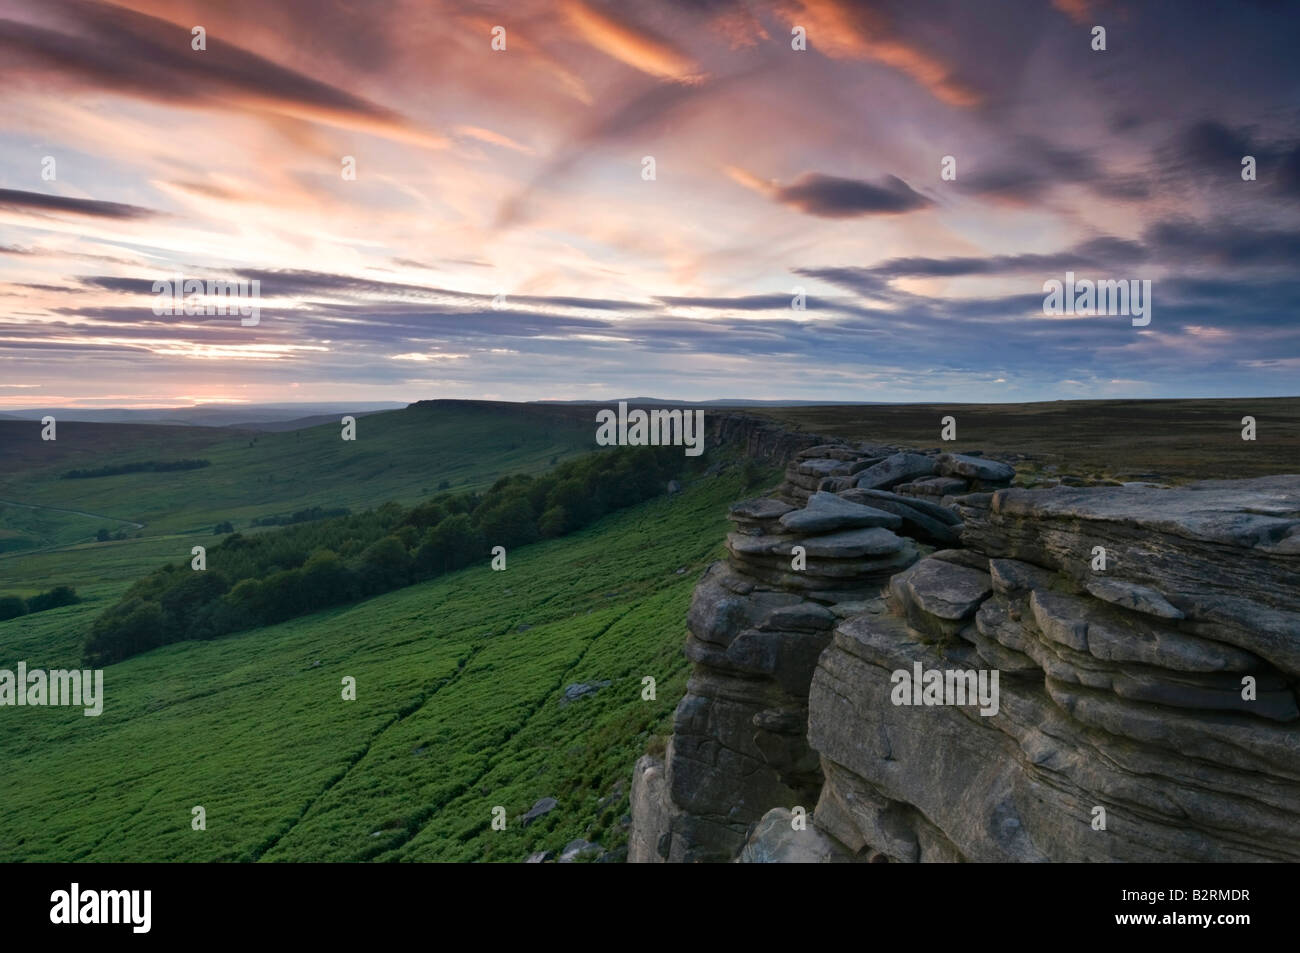 Stanage Edge at Sunset, Peak District National Park, Derbyshire, England, UK - Stock Image